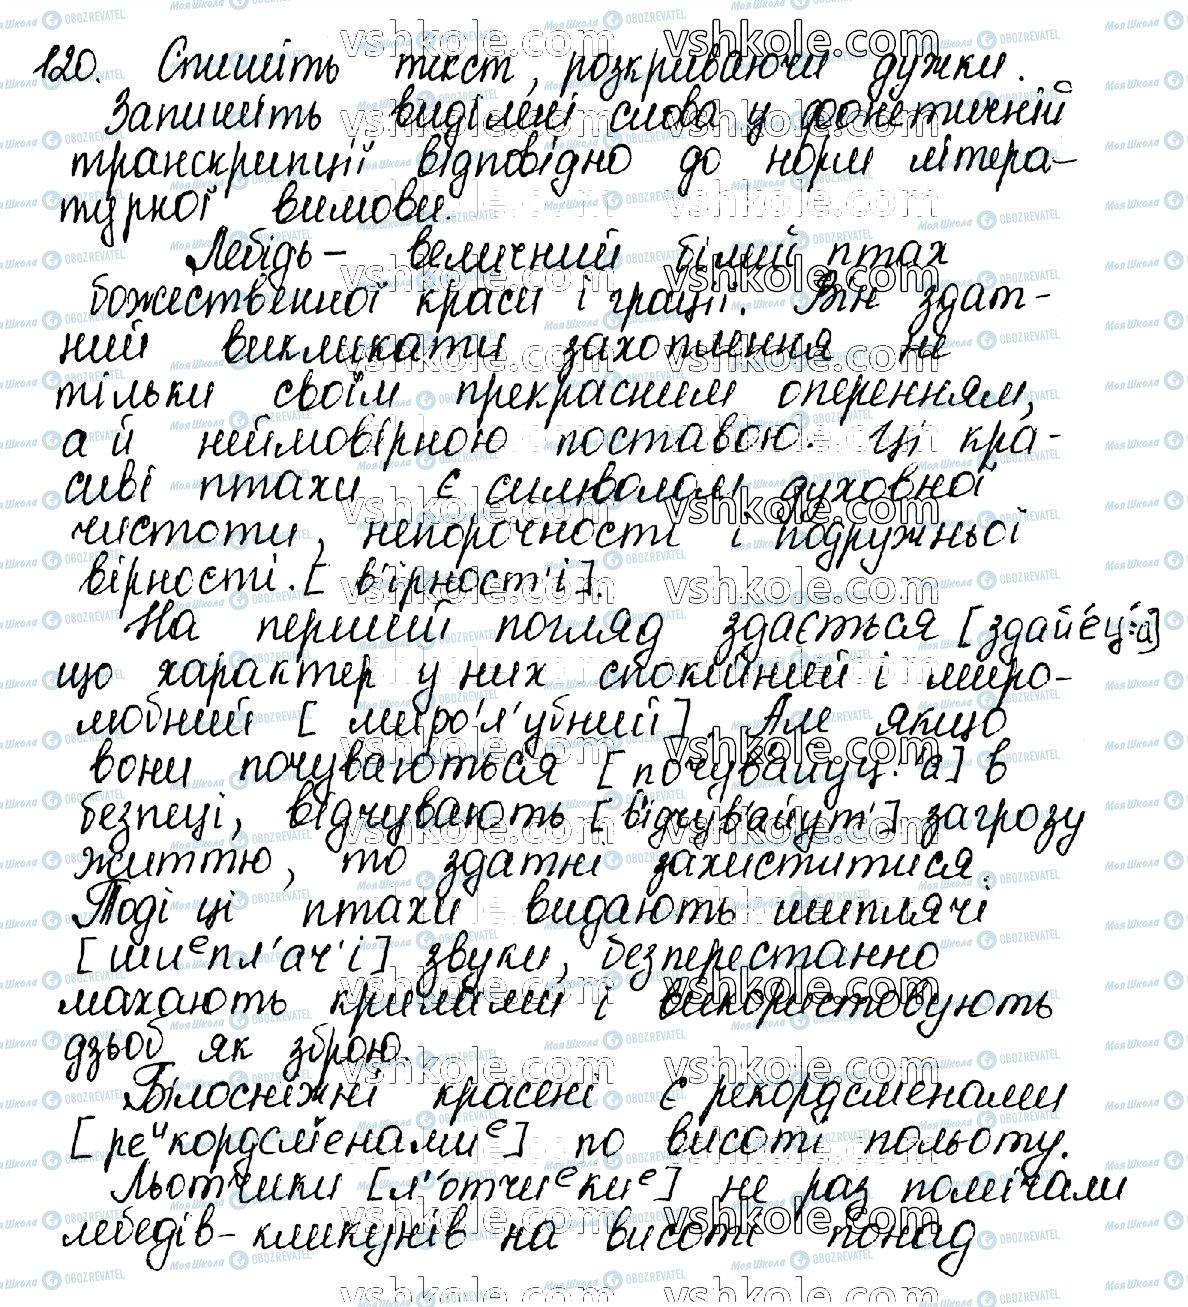 ГДЗ Укр мова 10 класс страница 120